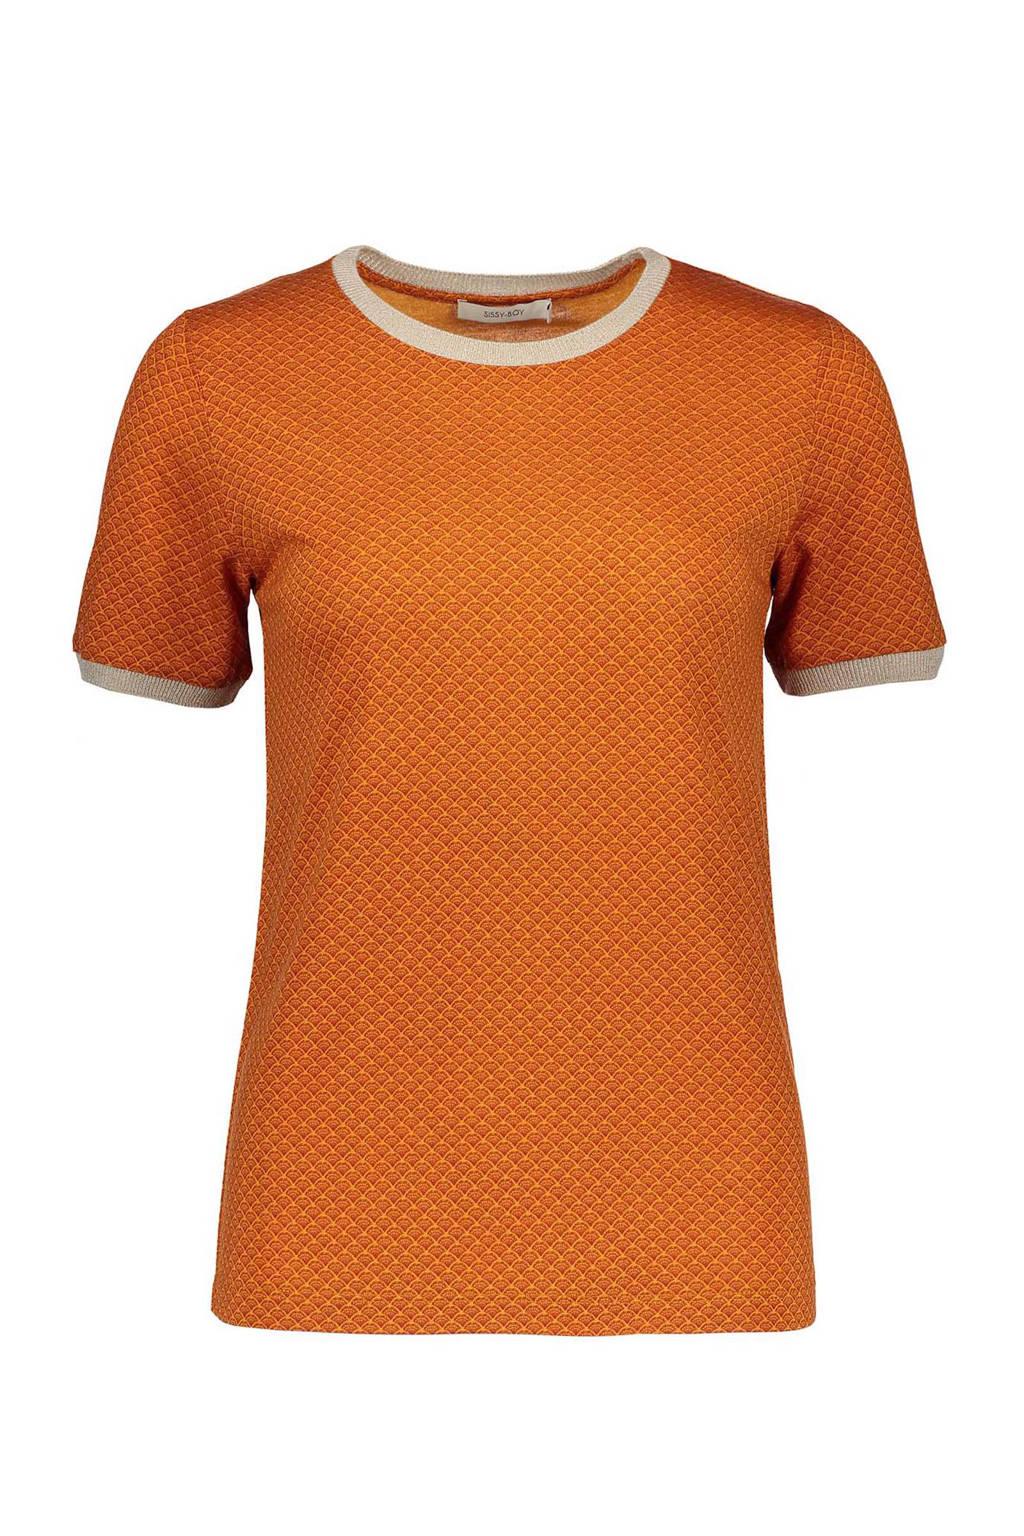 Sissy-Boy T-shirt oranje, Terra